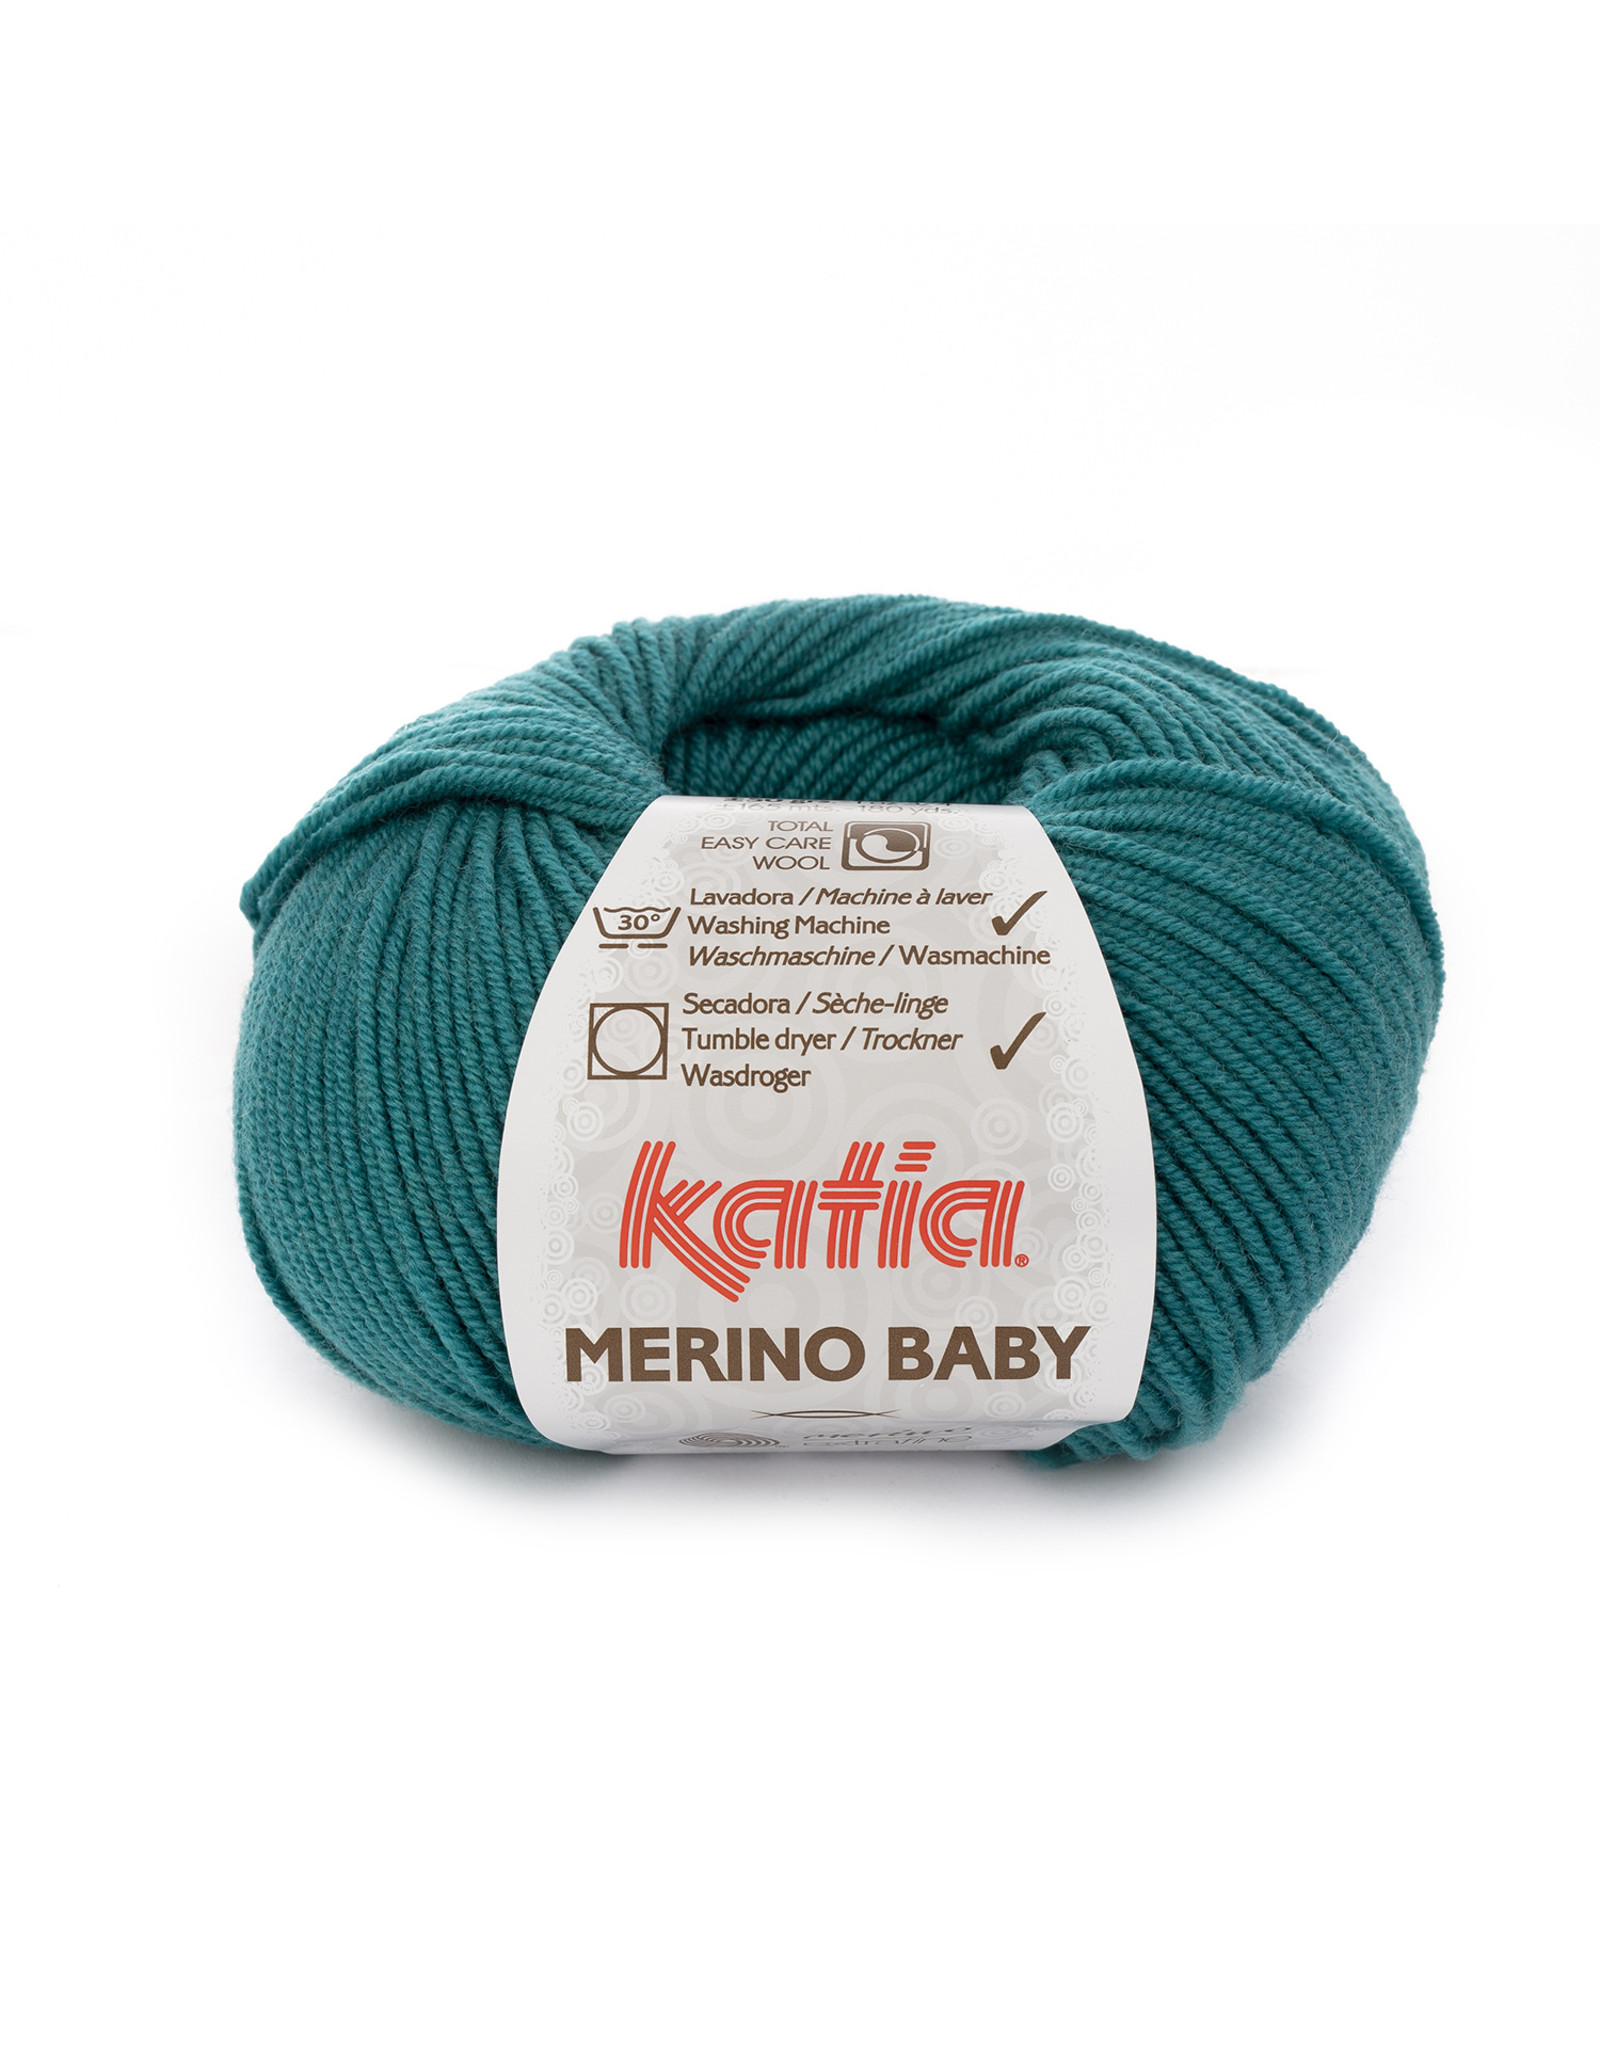 Katia Katia Merino Baby - 75 smaragdgroen - 50 gr. = 165 m.